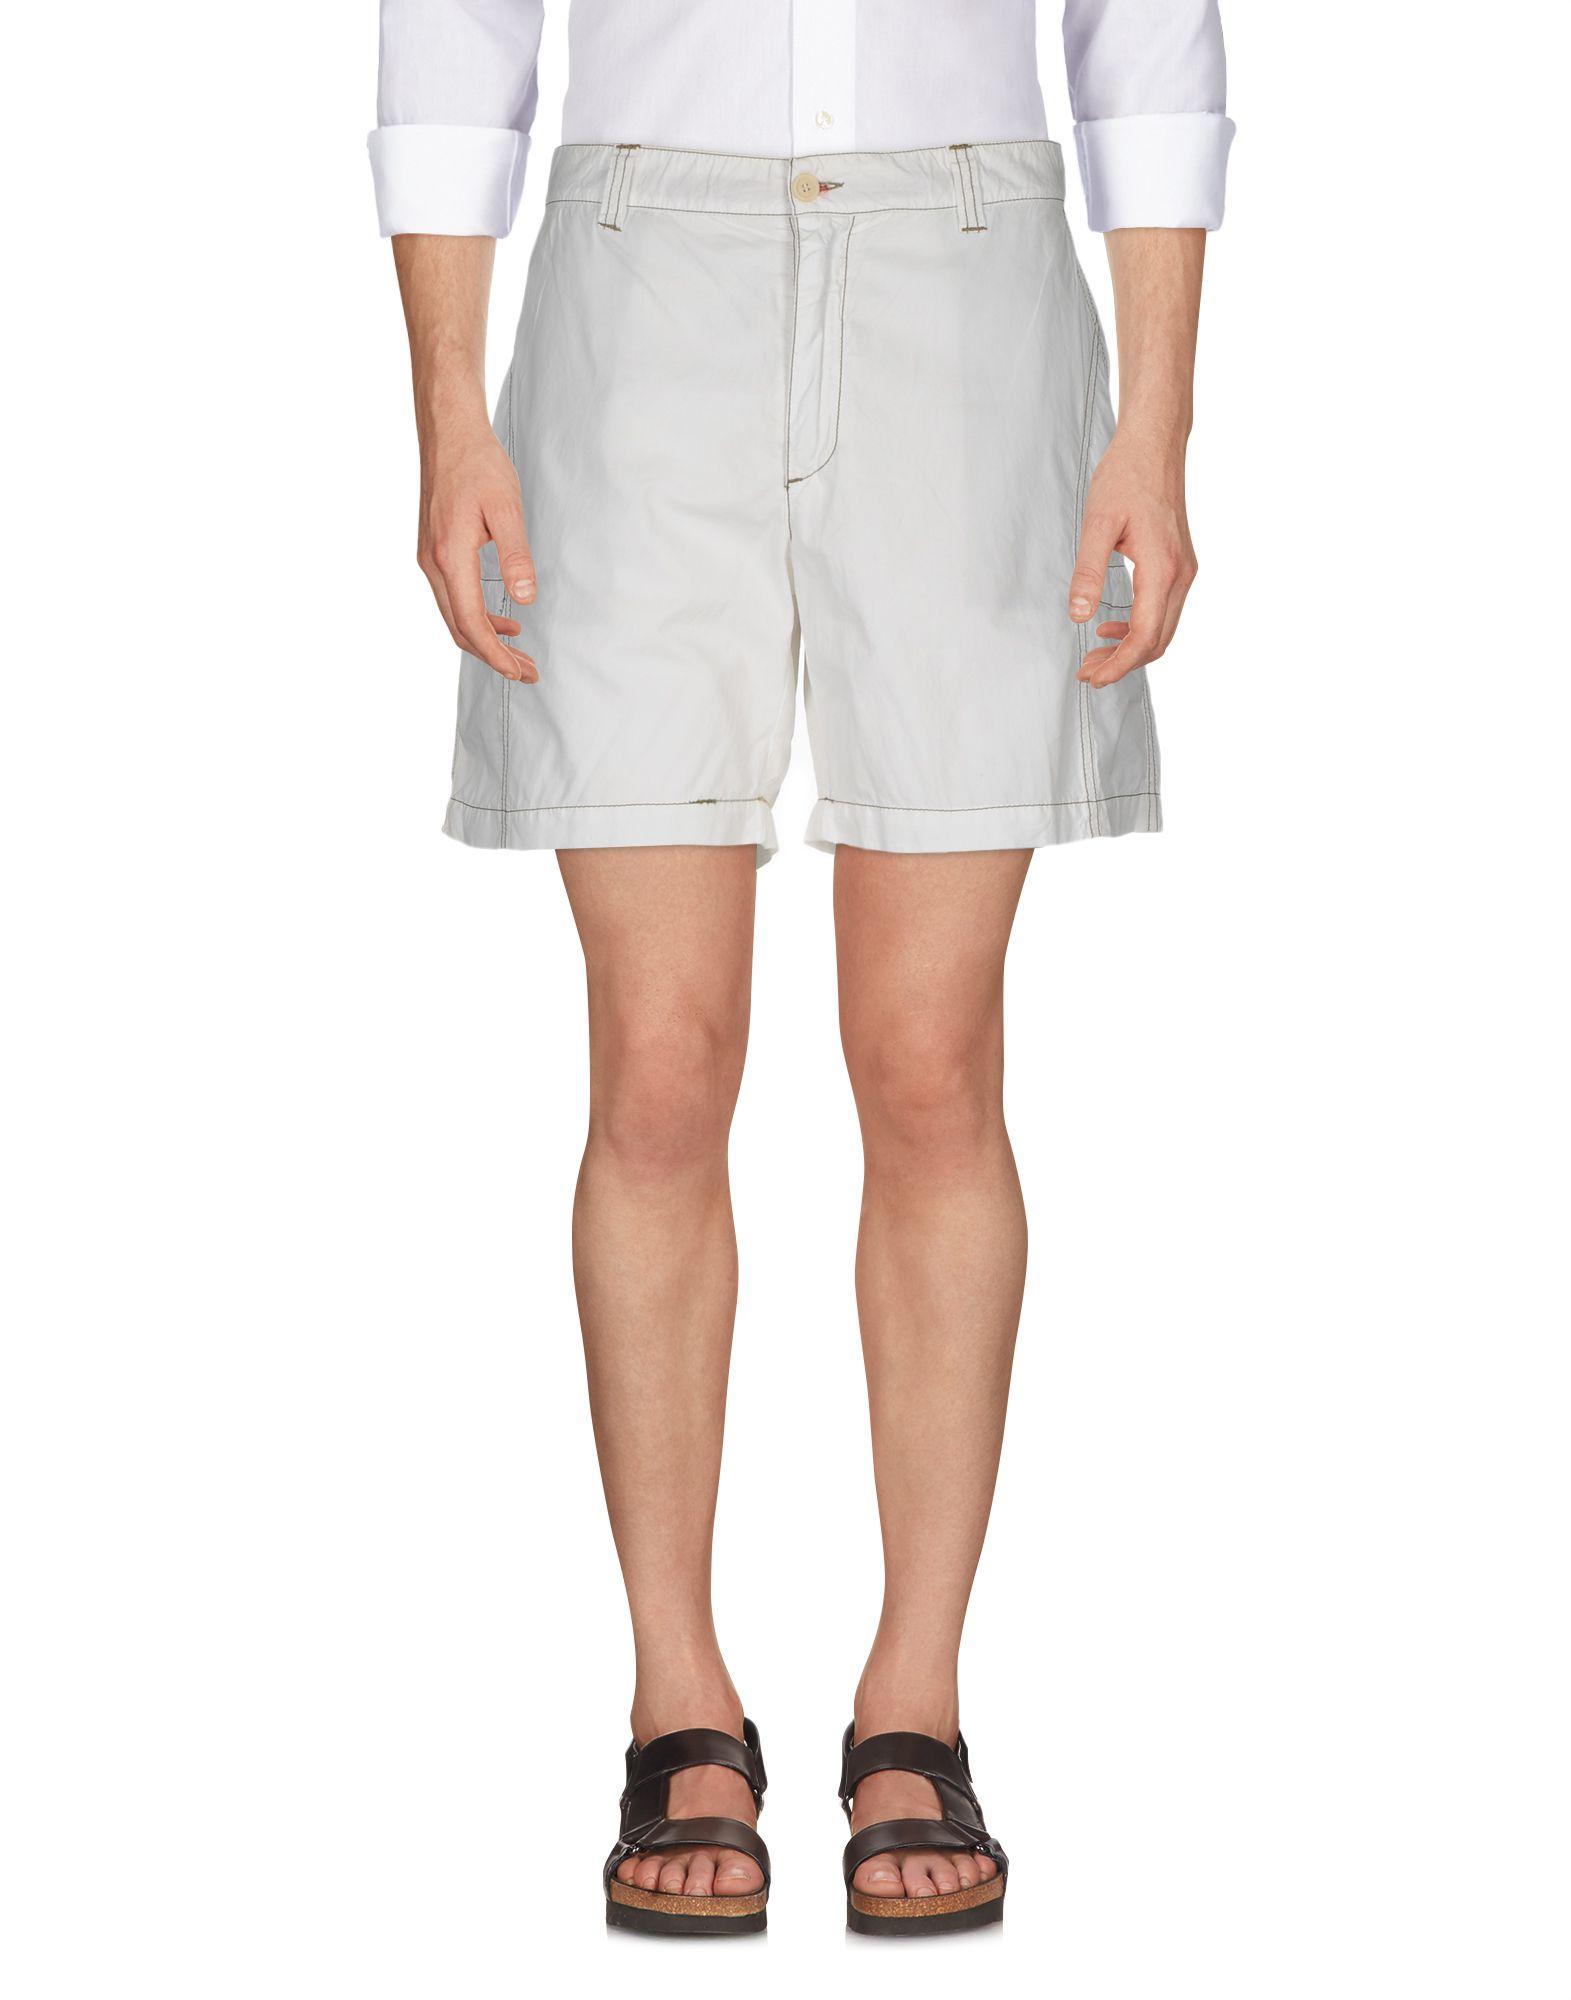 MARINA YACHTING Повседневные шорты блуза marina yachting b1 028 58626 00 65023 092